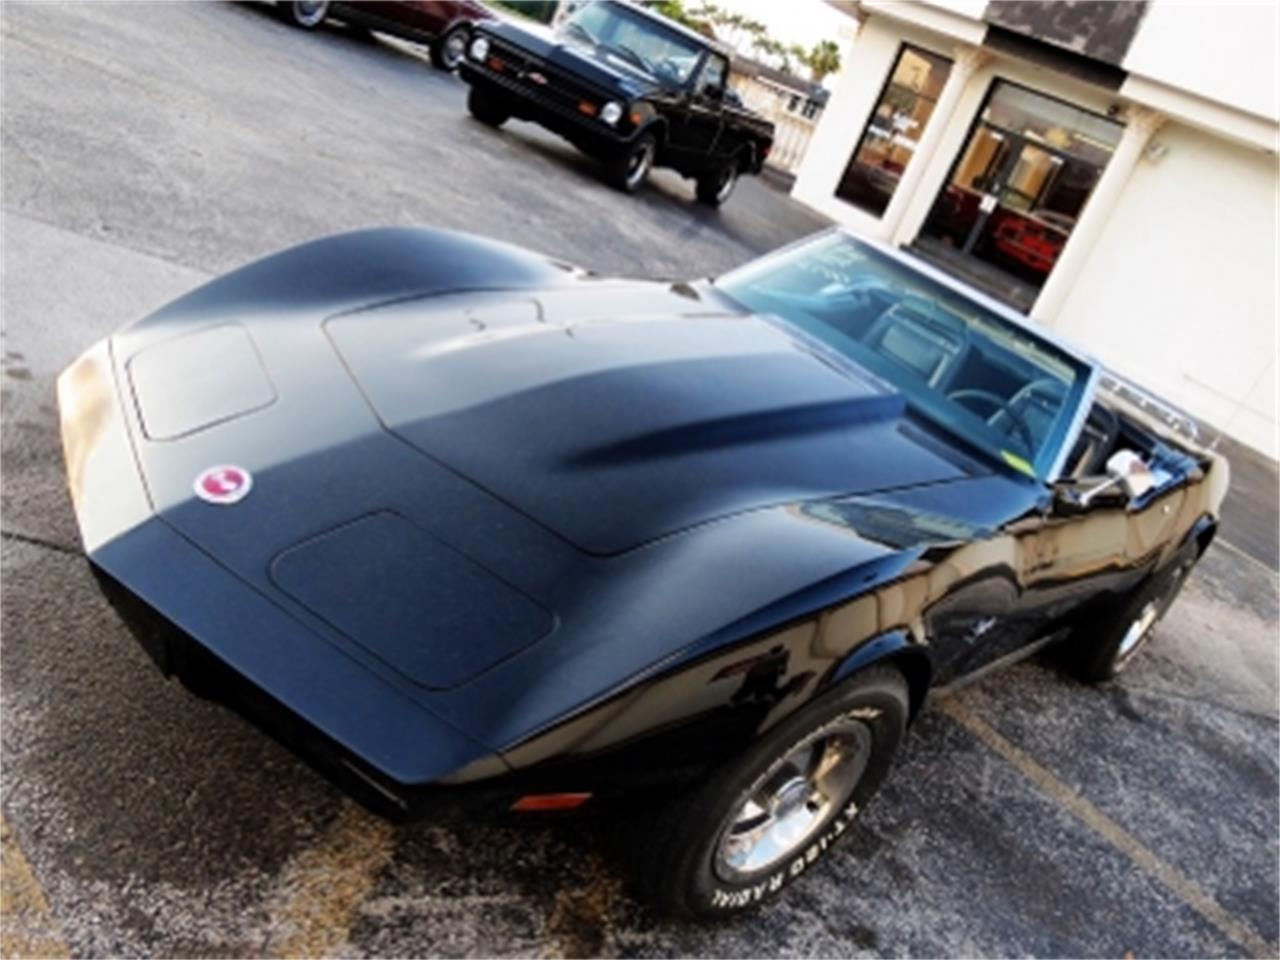 Large Picture of 1974 Chevrolet Corvette located in Miami Florida - $32,500.00 Offered by Sobe Classics - CRI8